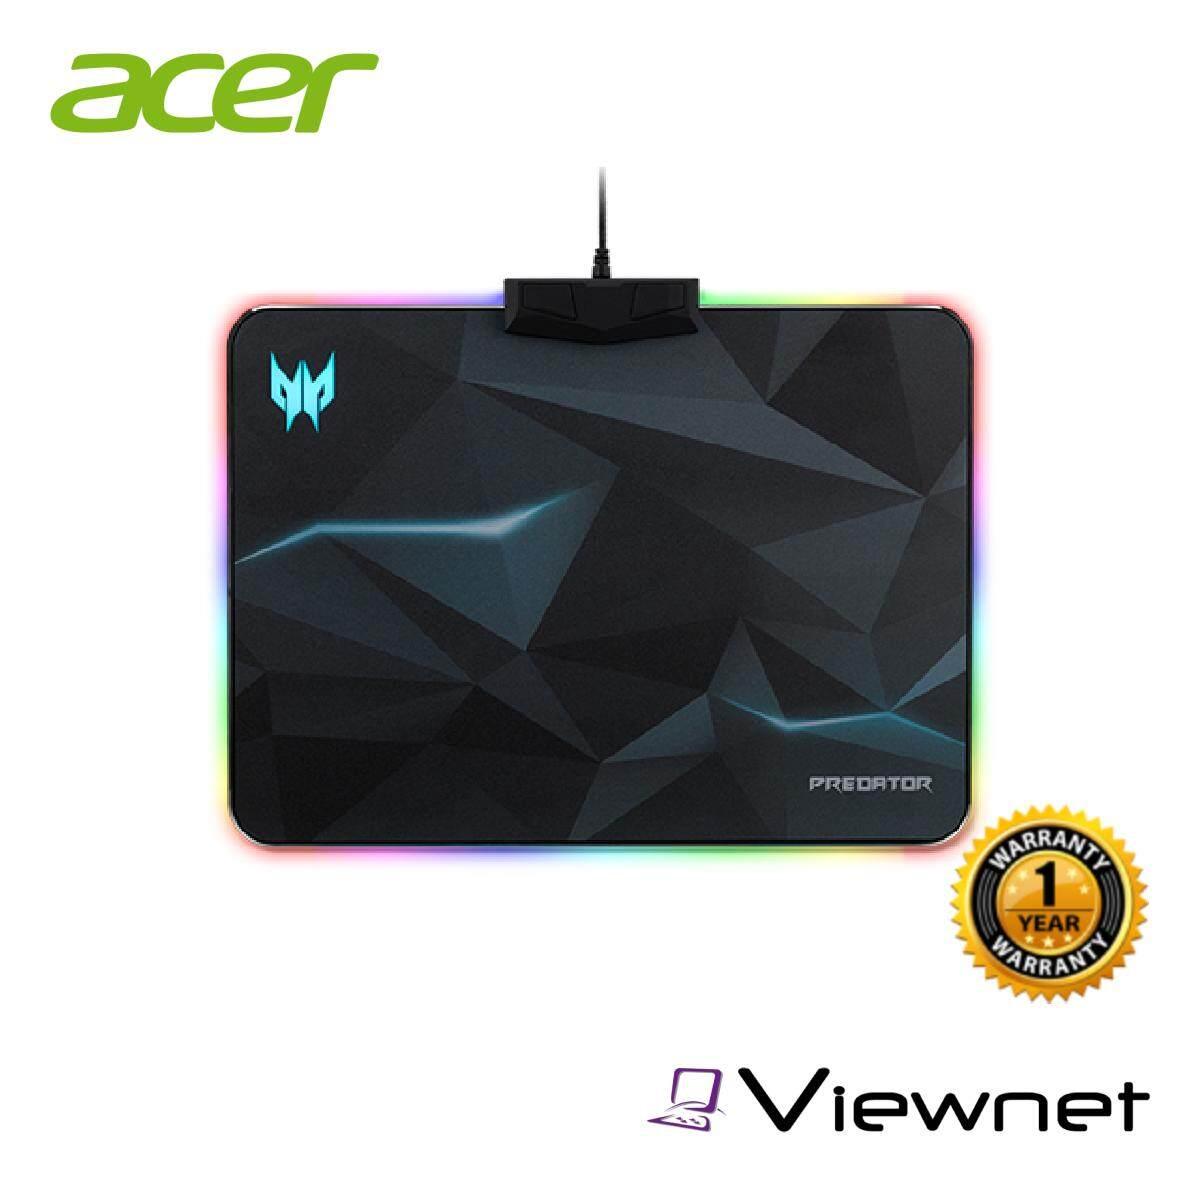 Acer Predator Mousepad Programmable RGB